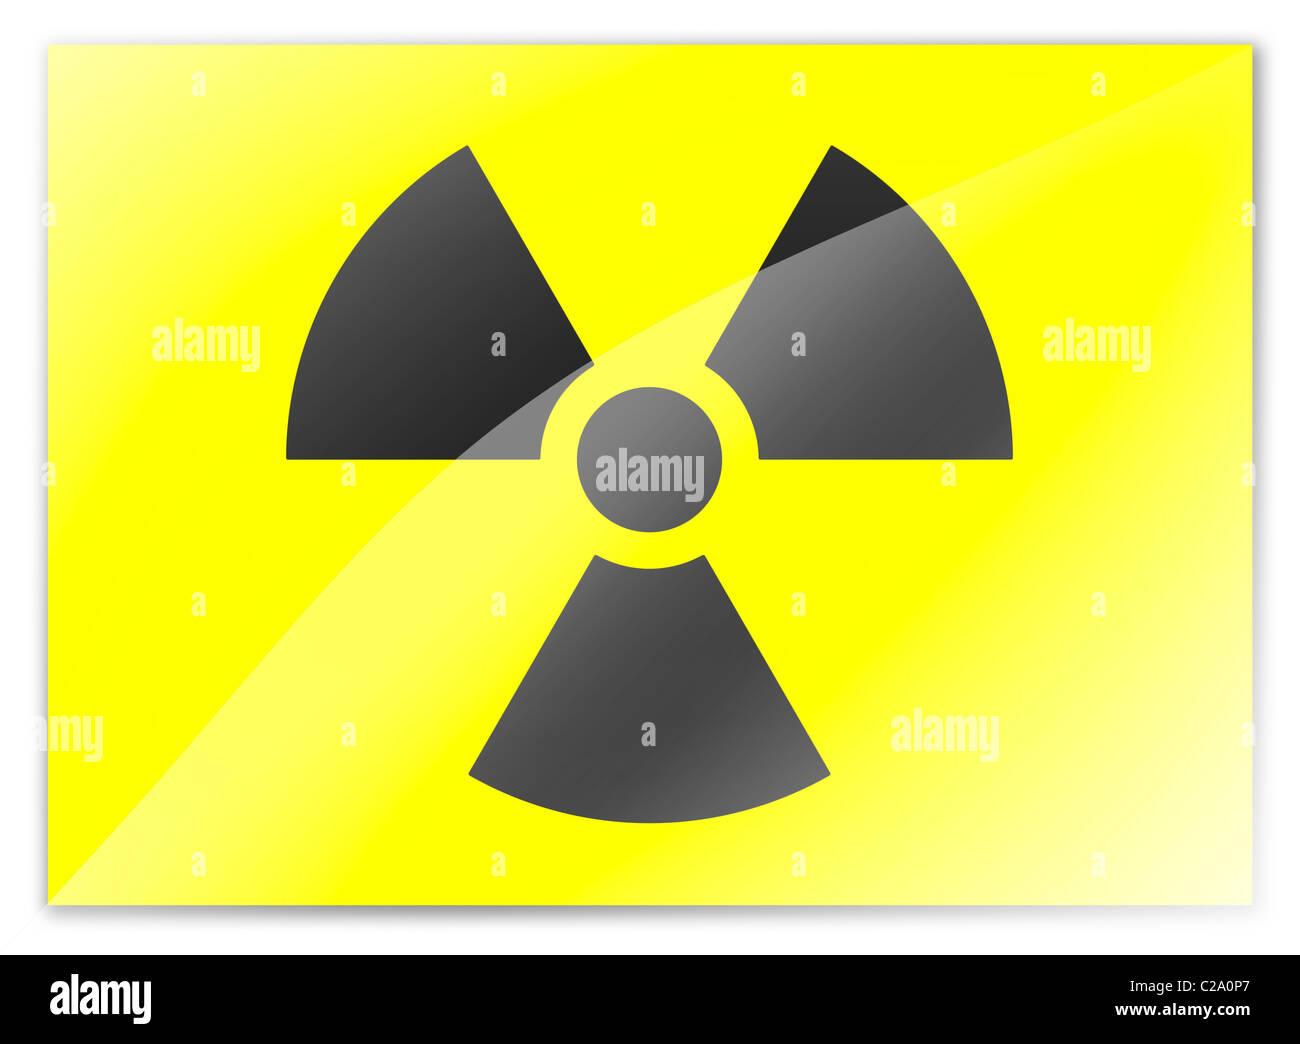 Radioactive symbol sign logo flag stock photo royalty free image radioactive symbol sign logo flag buycottarizona